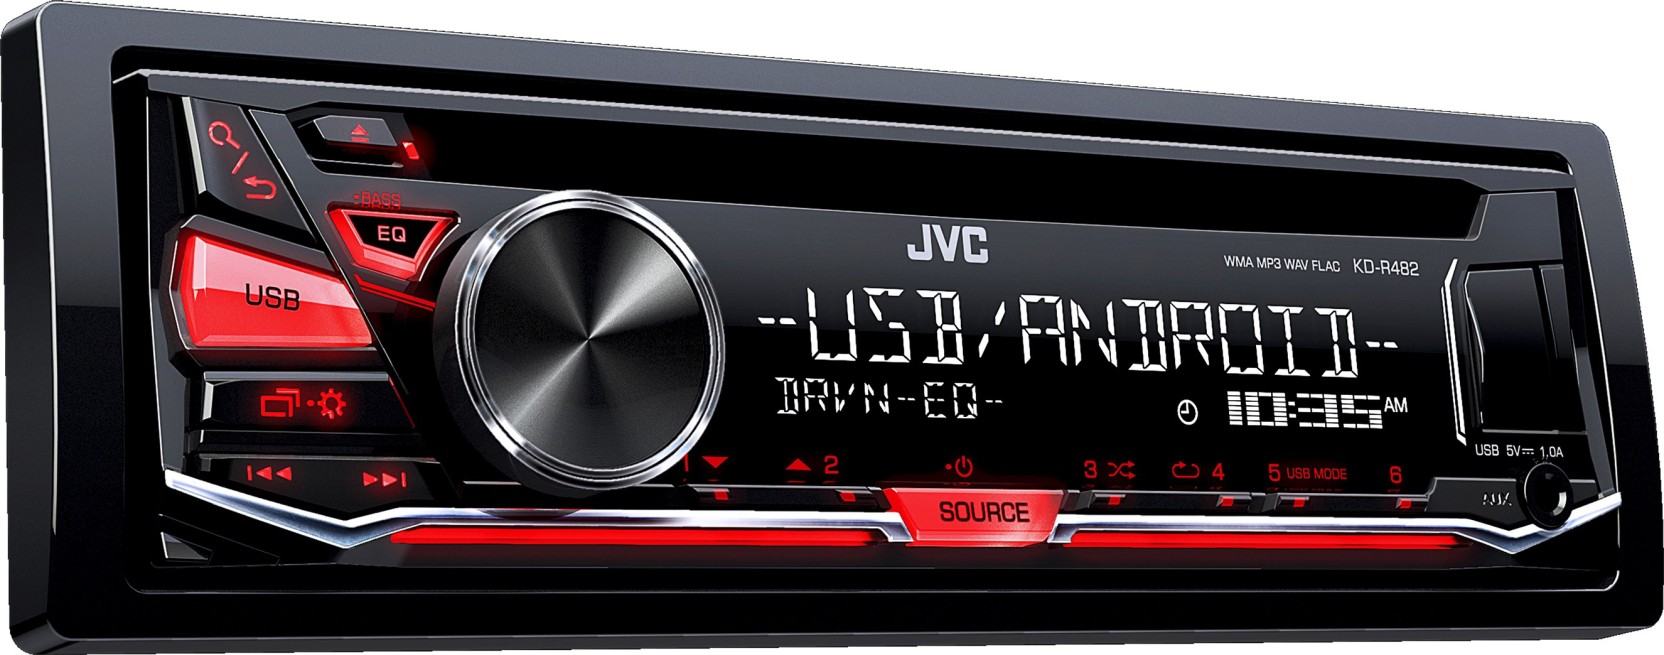 JVC KD-R482 Car Stereo. ADD TO CART